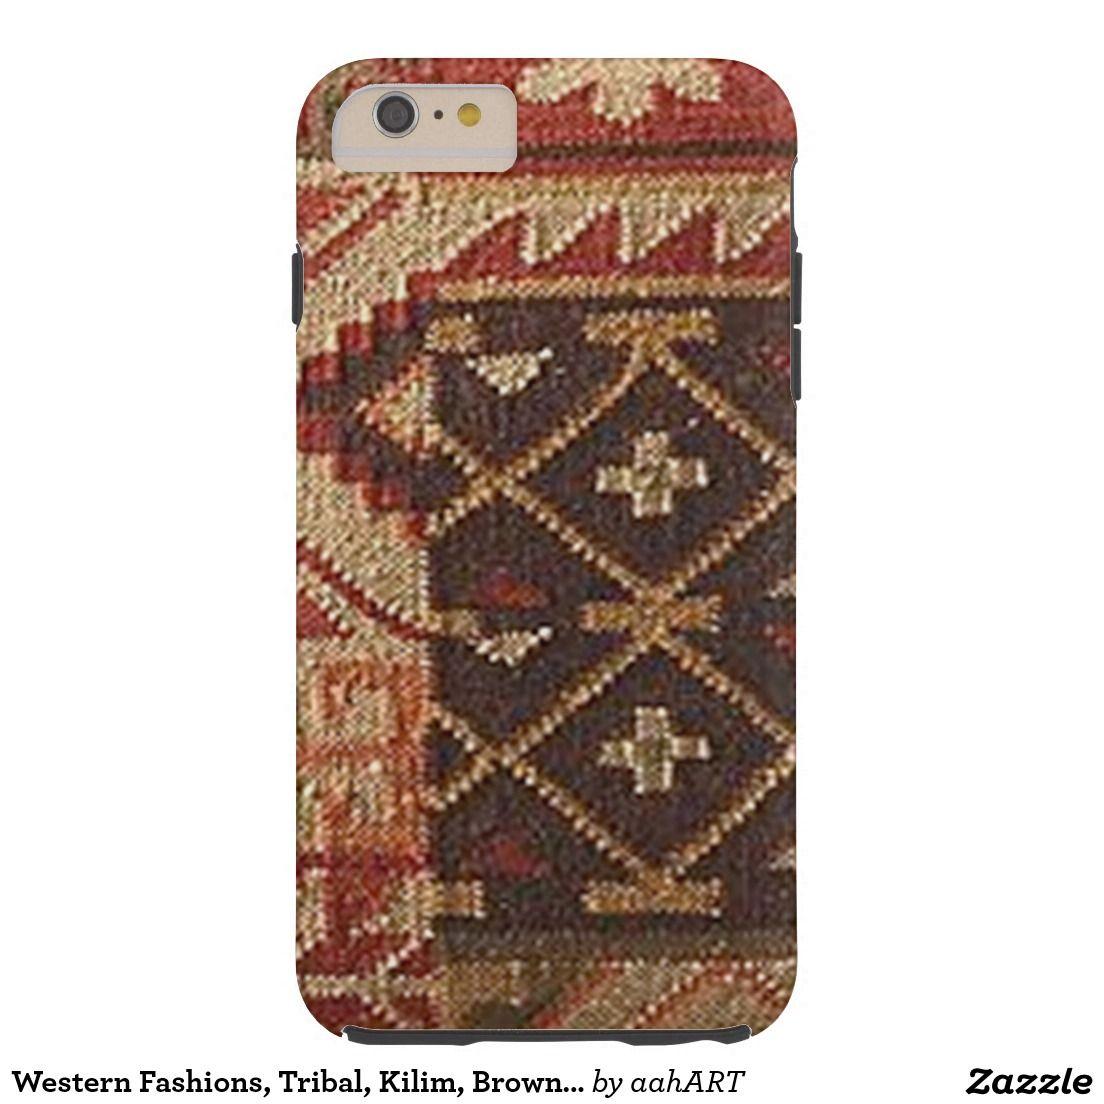 Western Fashions, Tribal, Kilim, Brown Earth Tones Tough iPhone 6 Plus Case